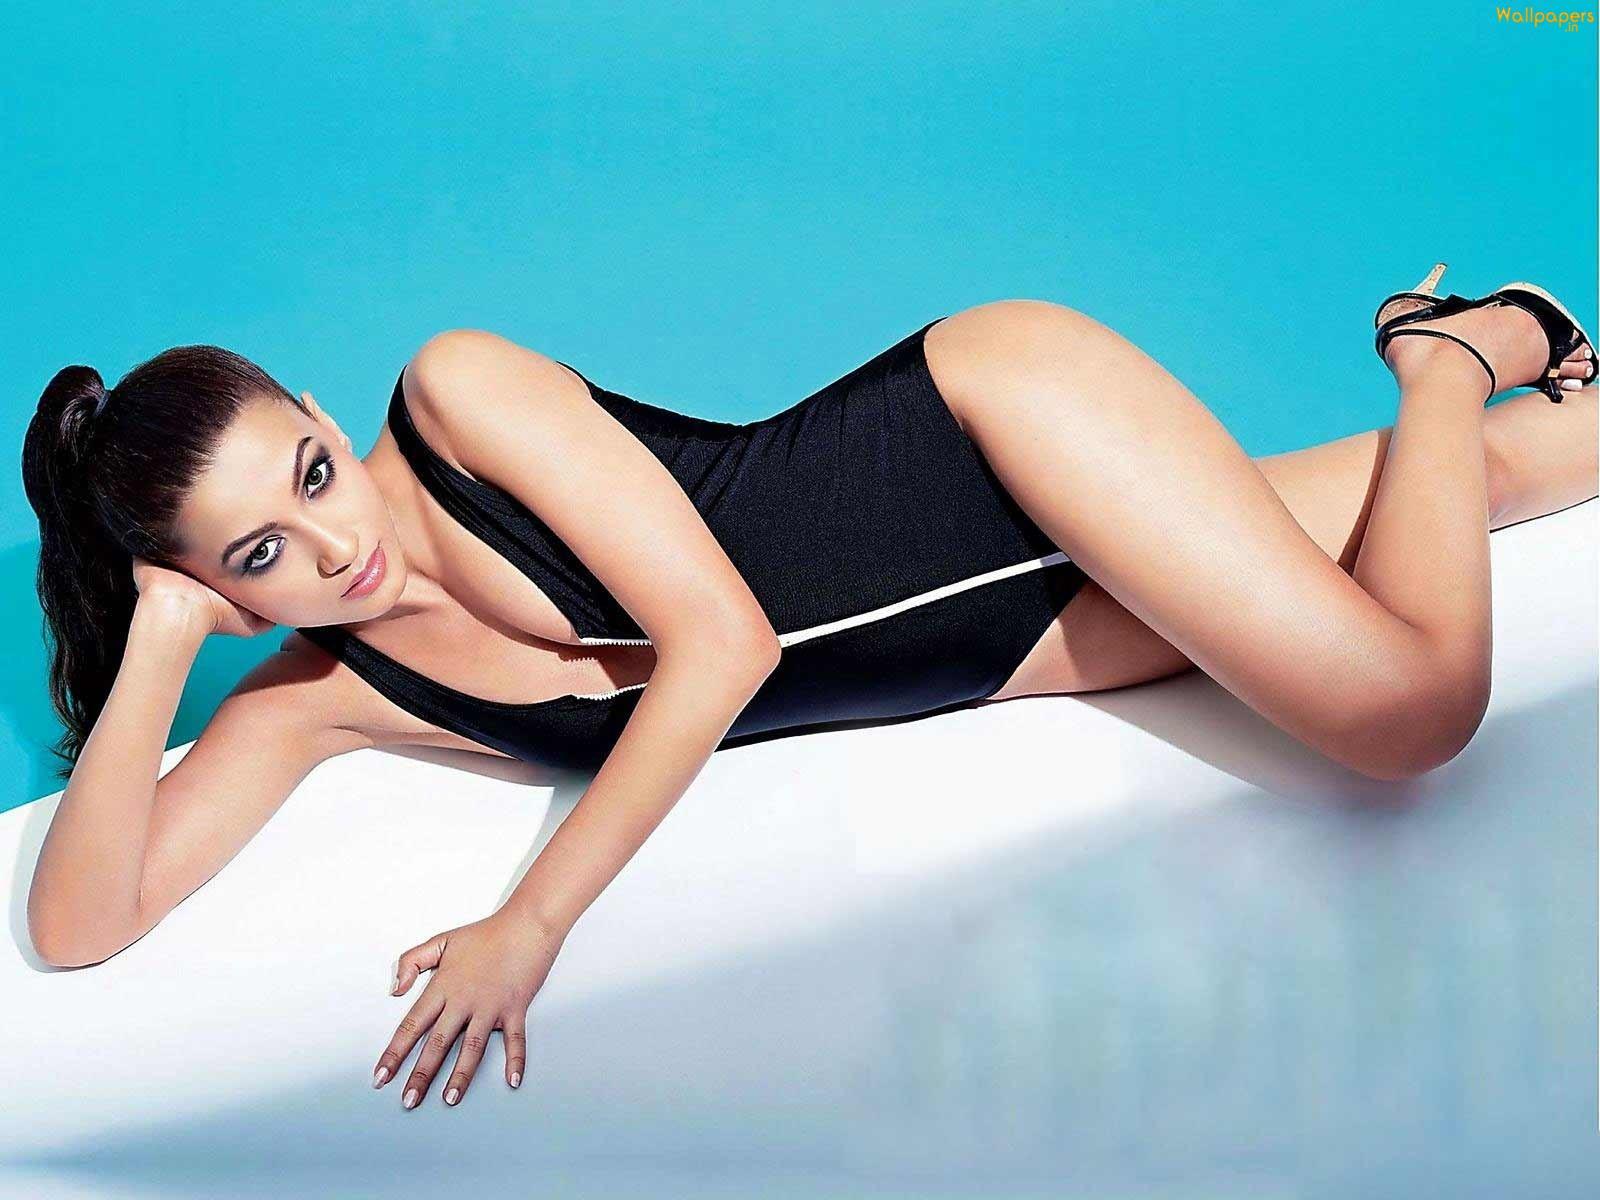 http://1.bp.blogspot.com/-EX-lMzy-bgs/Txw-f4a13TI/AAAAAAAAAg0/AC5VXYk_WfU/s1600/gauhar_khan_bikini-1600x1200.jpg